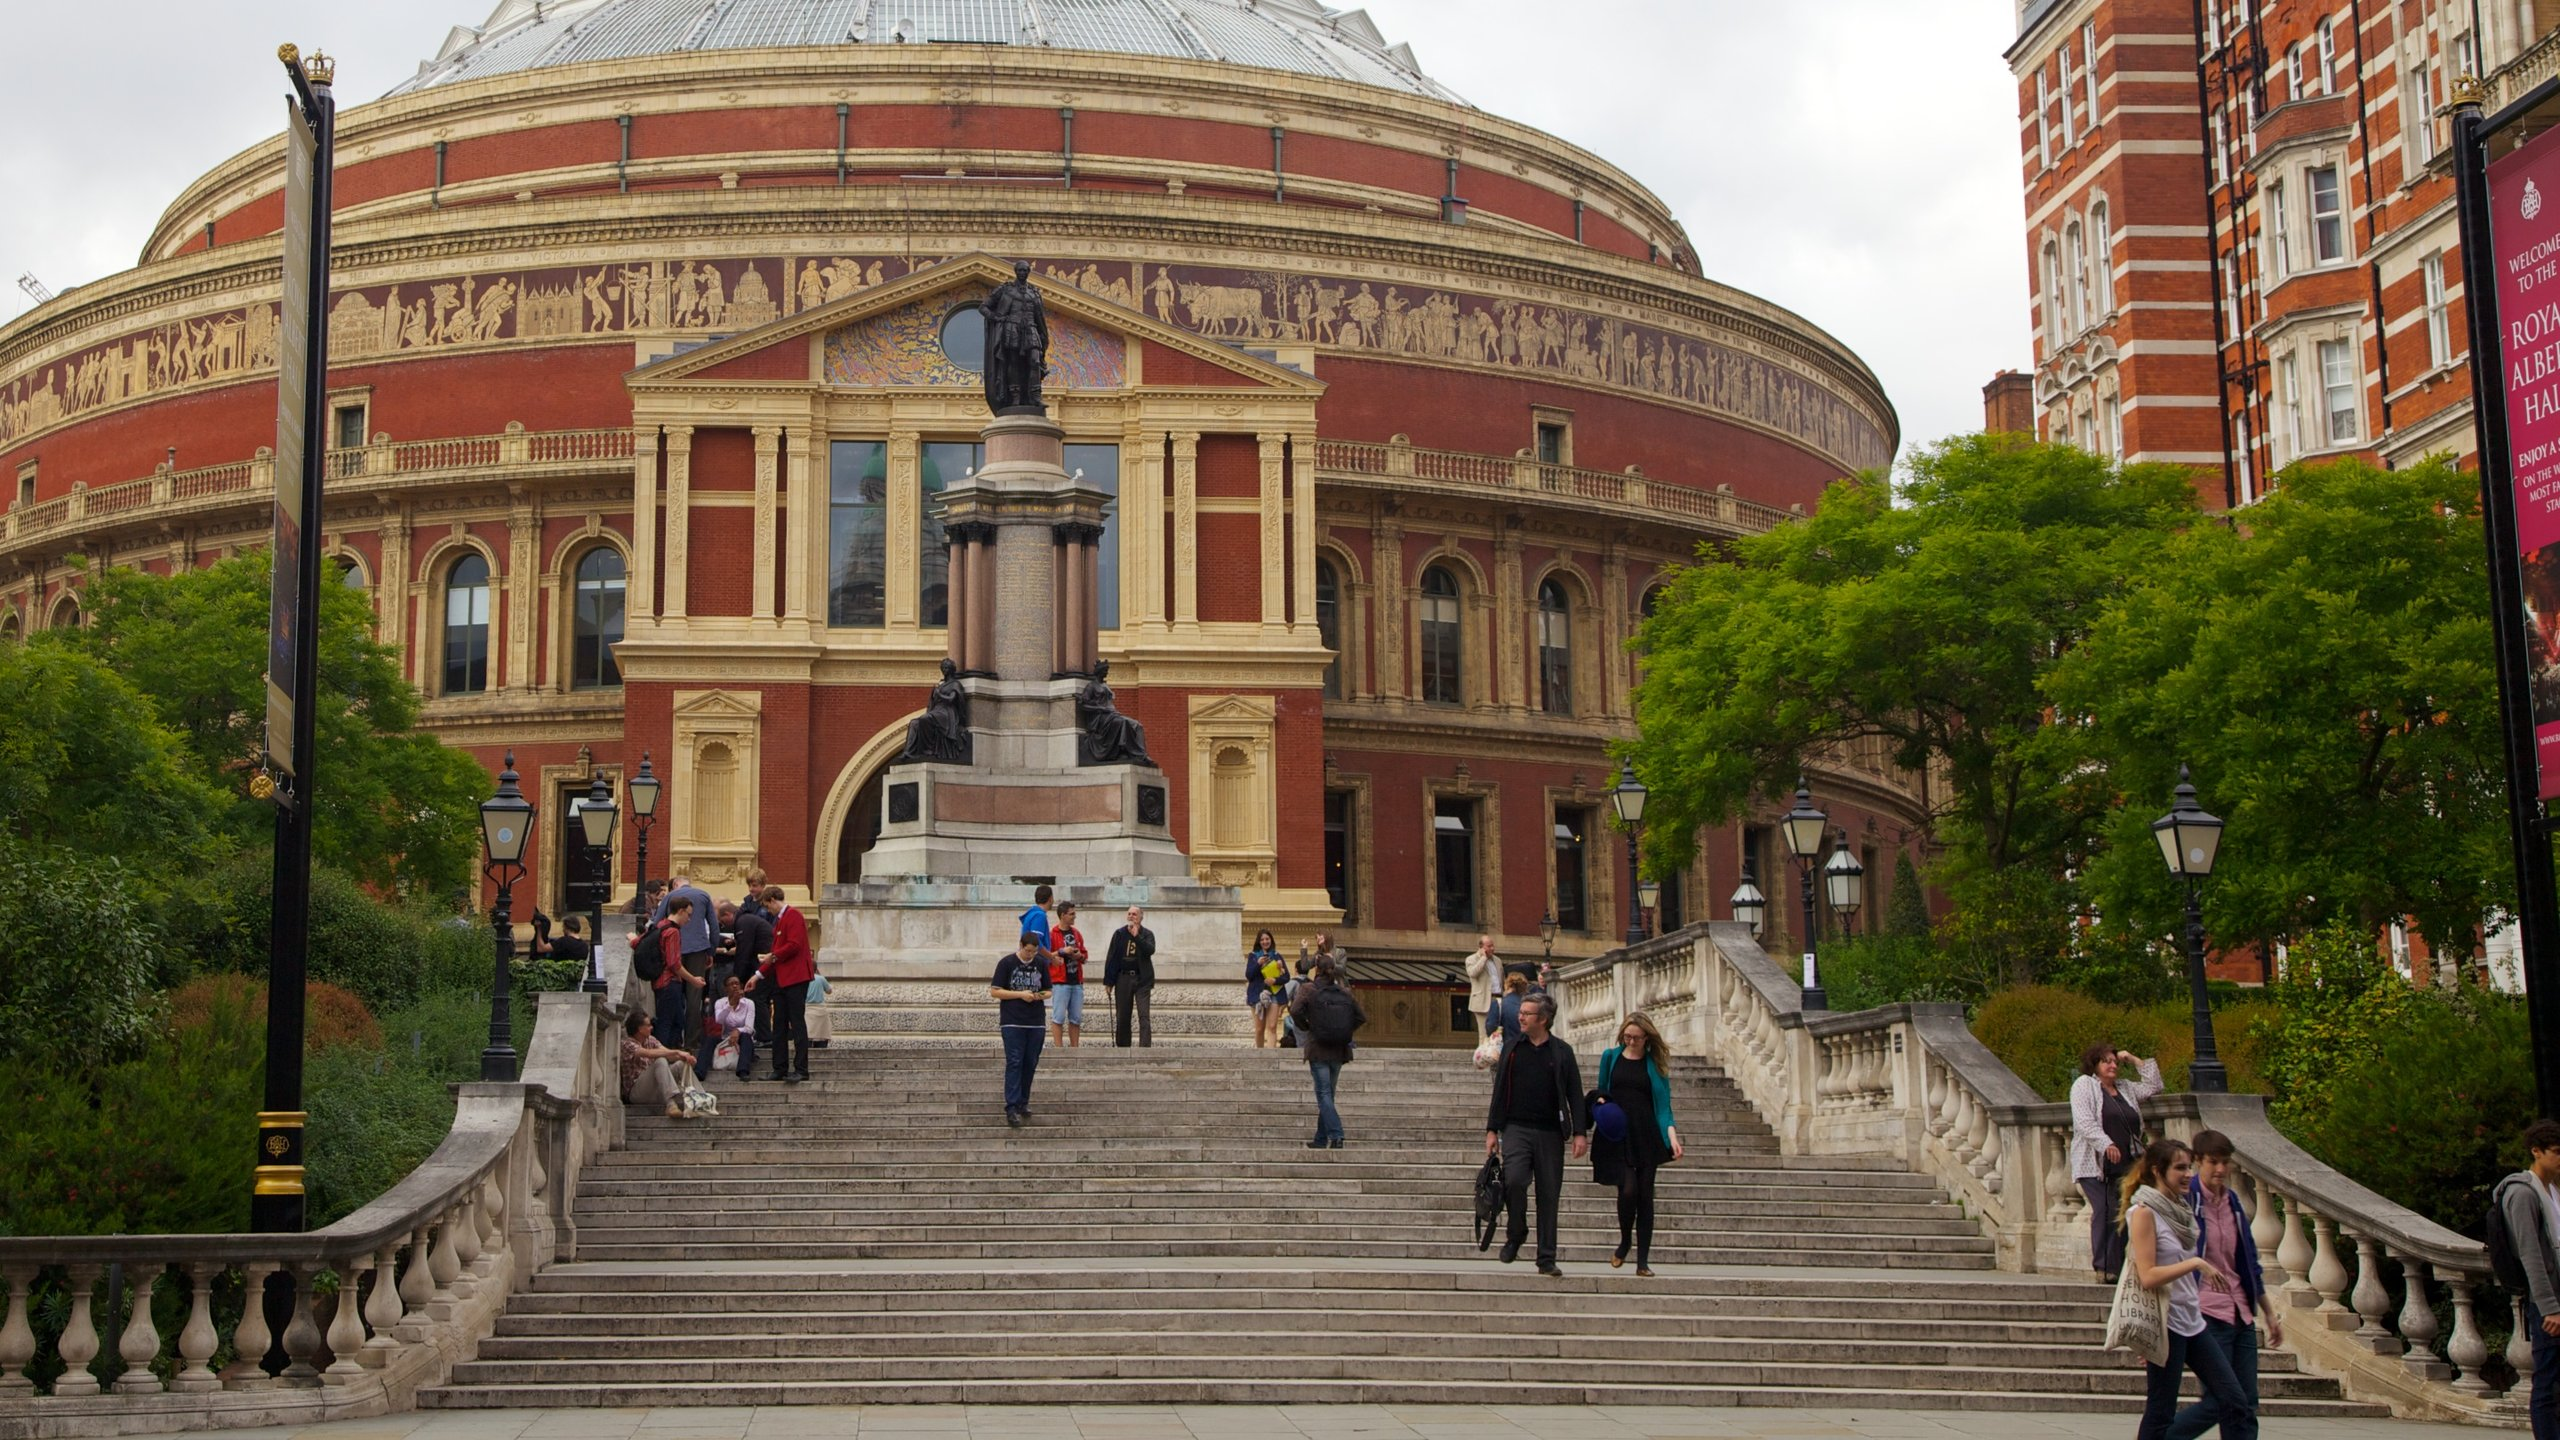 Royal Albert Hall, London, England, Großbritannien